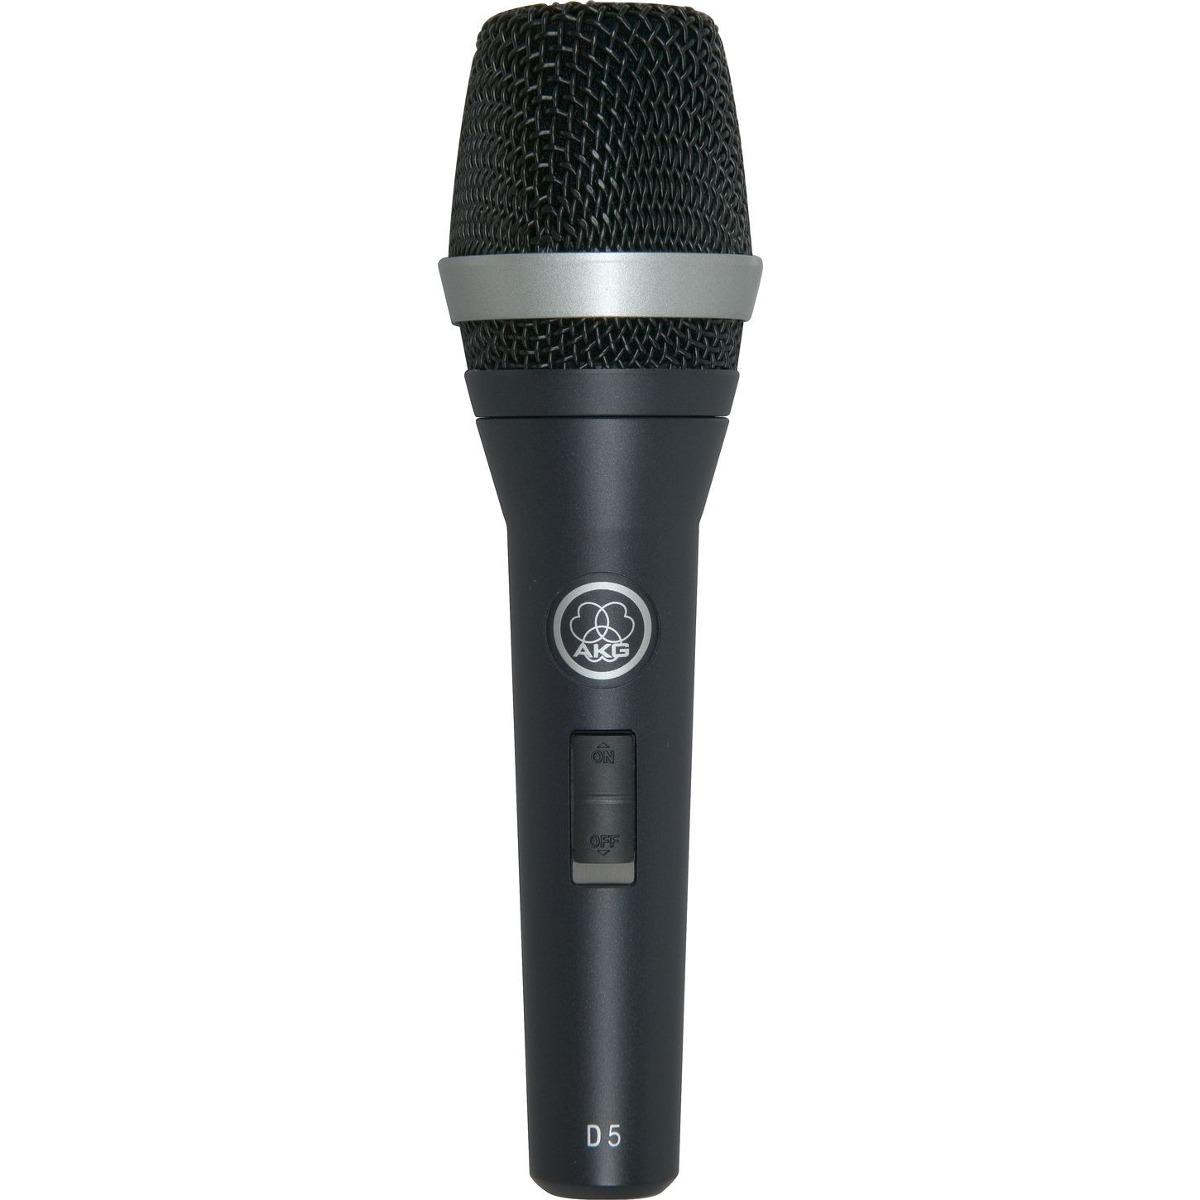 microfone-akg-d5-vocal-dinmico-17783-MLB20143879435_082014-F